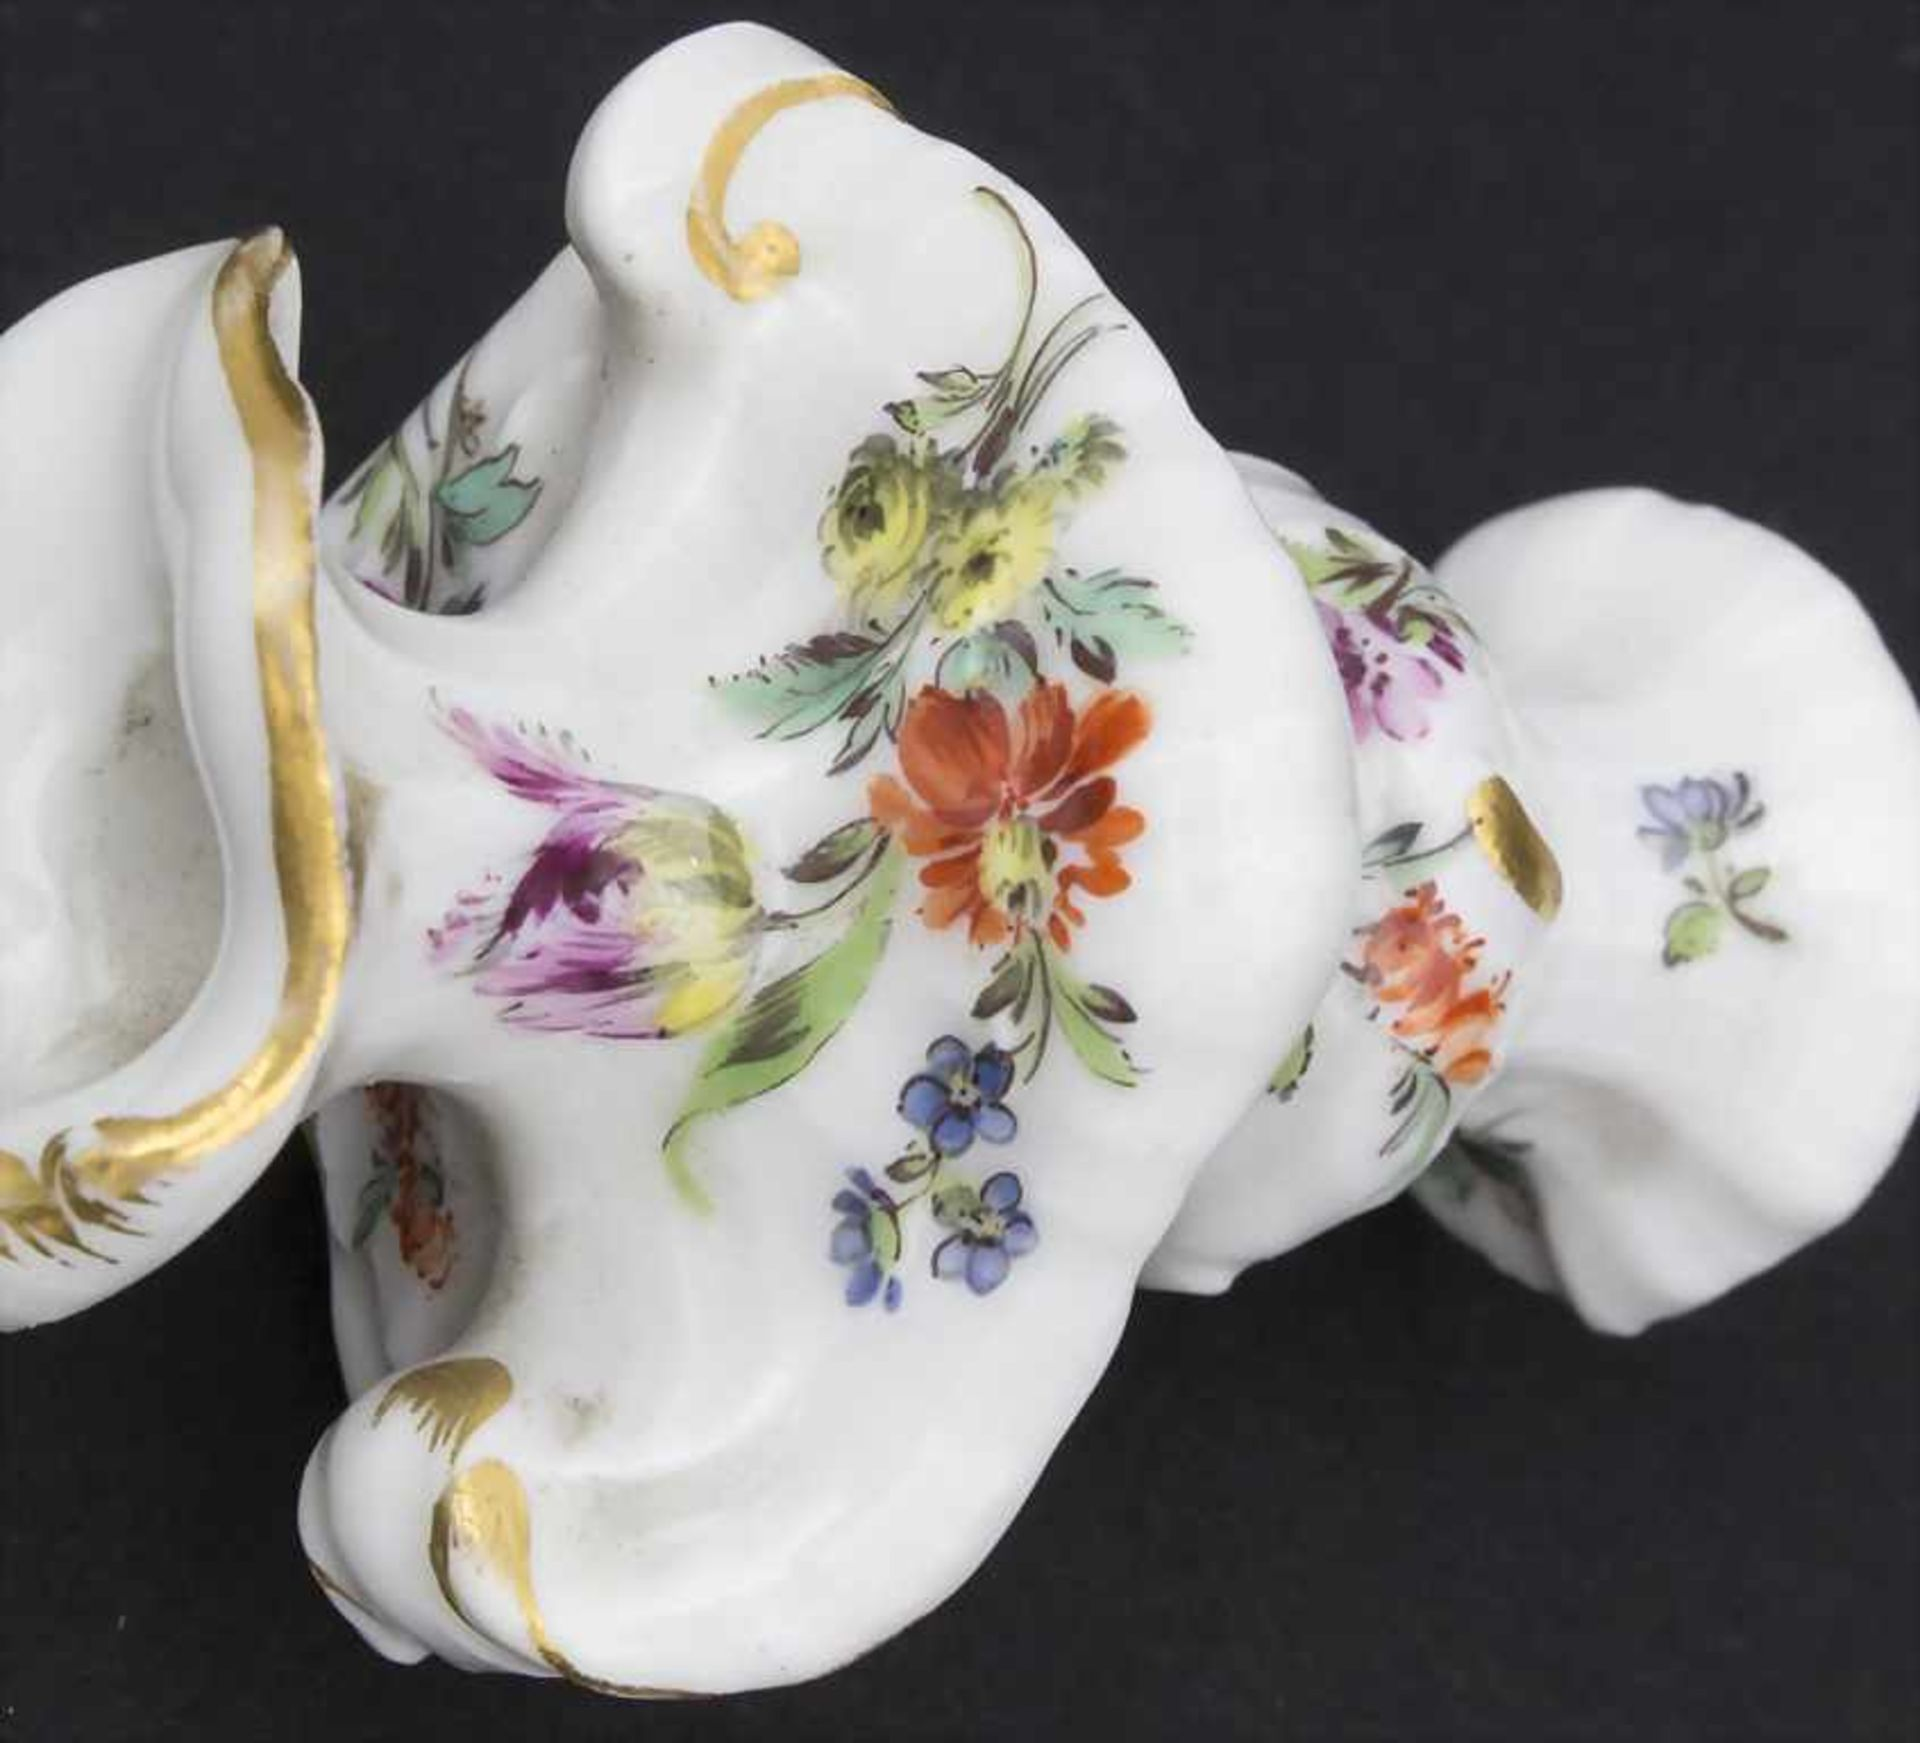 3 frühe Miniatur Vasen mit Rocaillen / A set of 3 early miniature vases with rocailles, Meissen, - Bild 6 aus 14